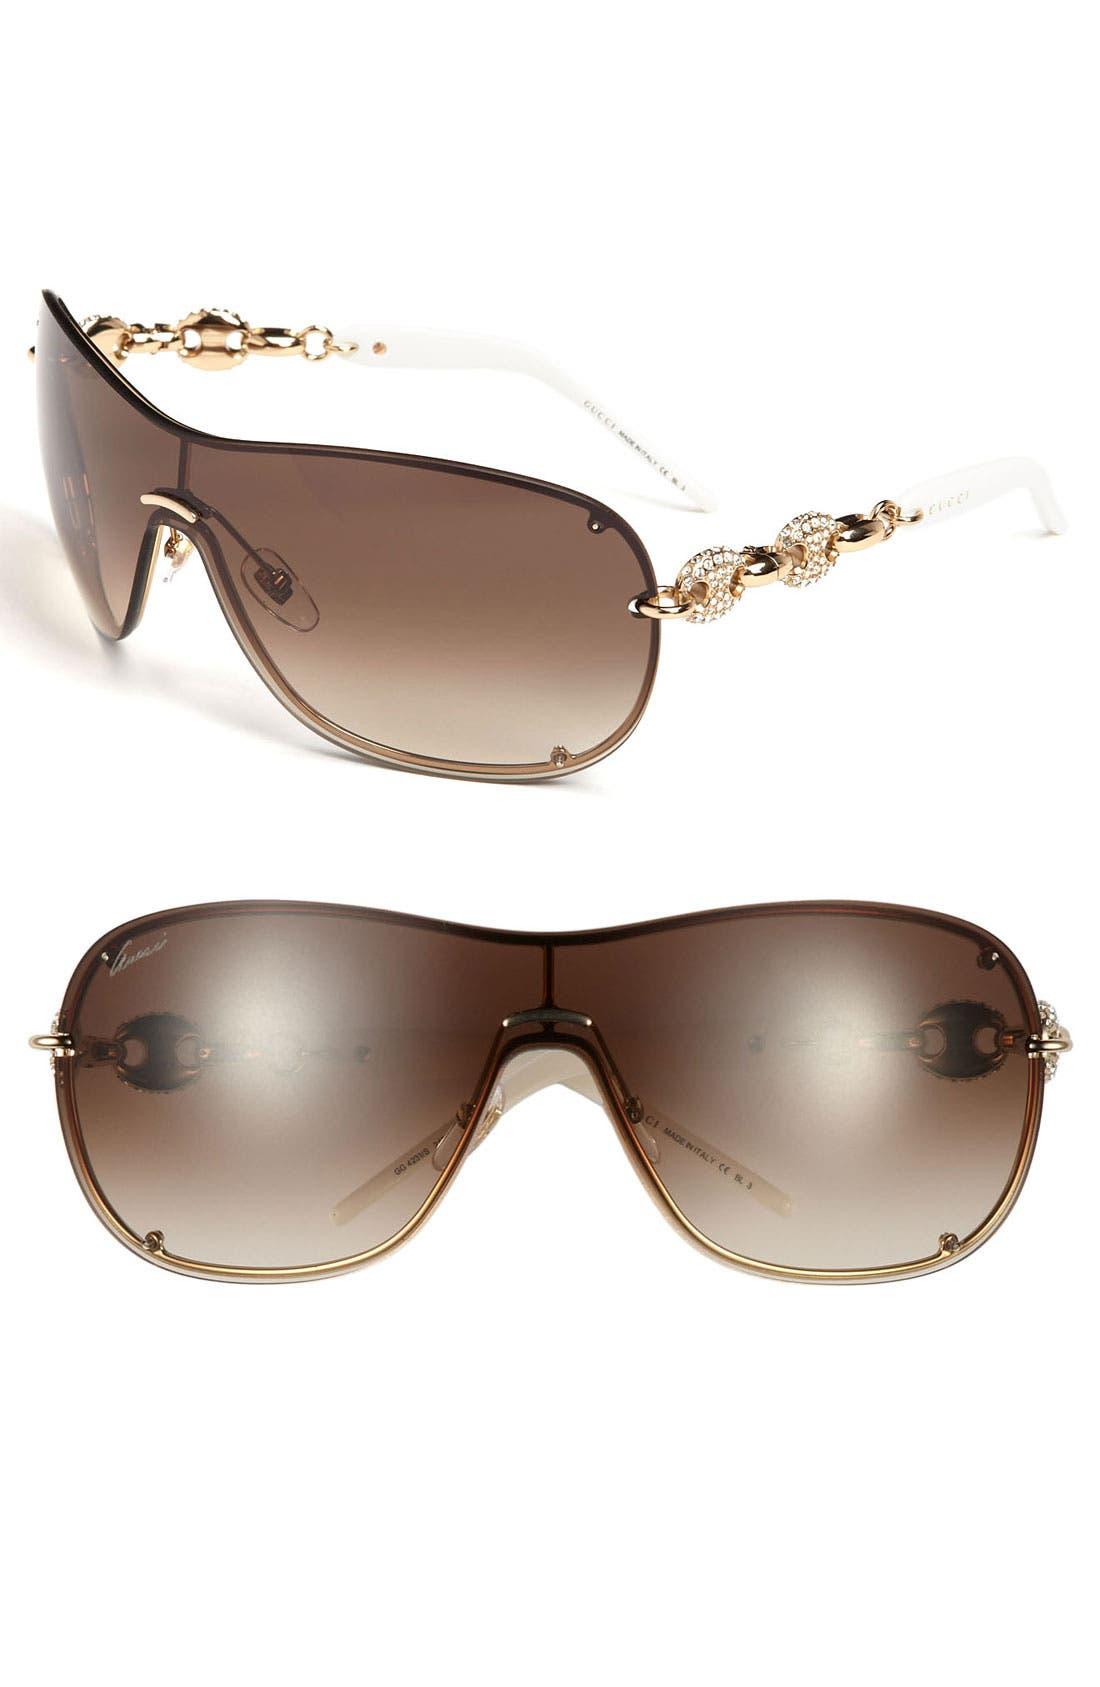 Alternate Image 1 Selected - Gucci 99mm Rimless Shield Sunglasses